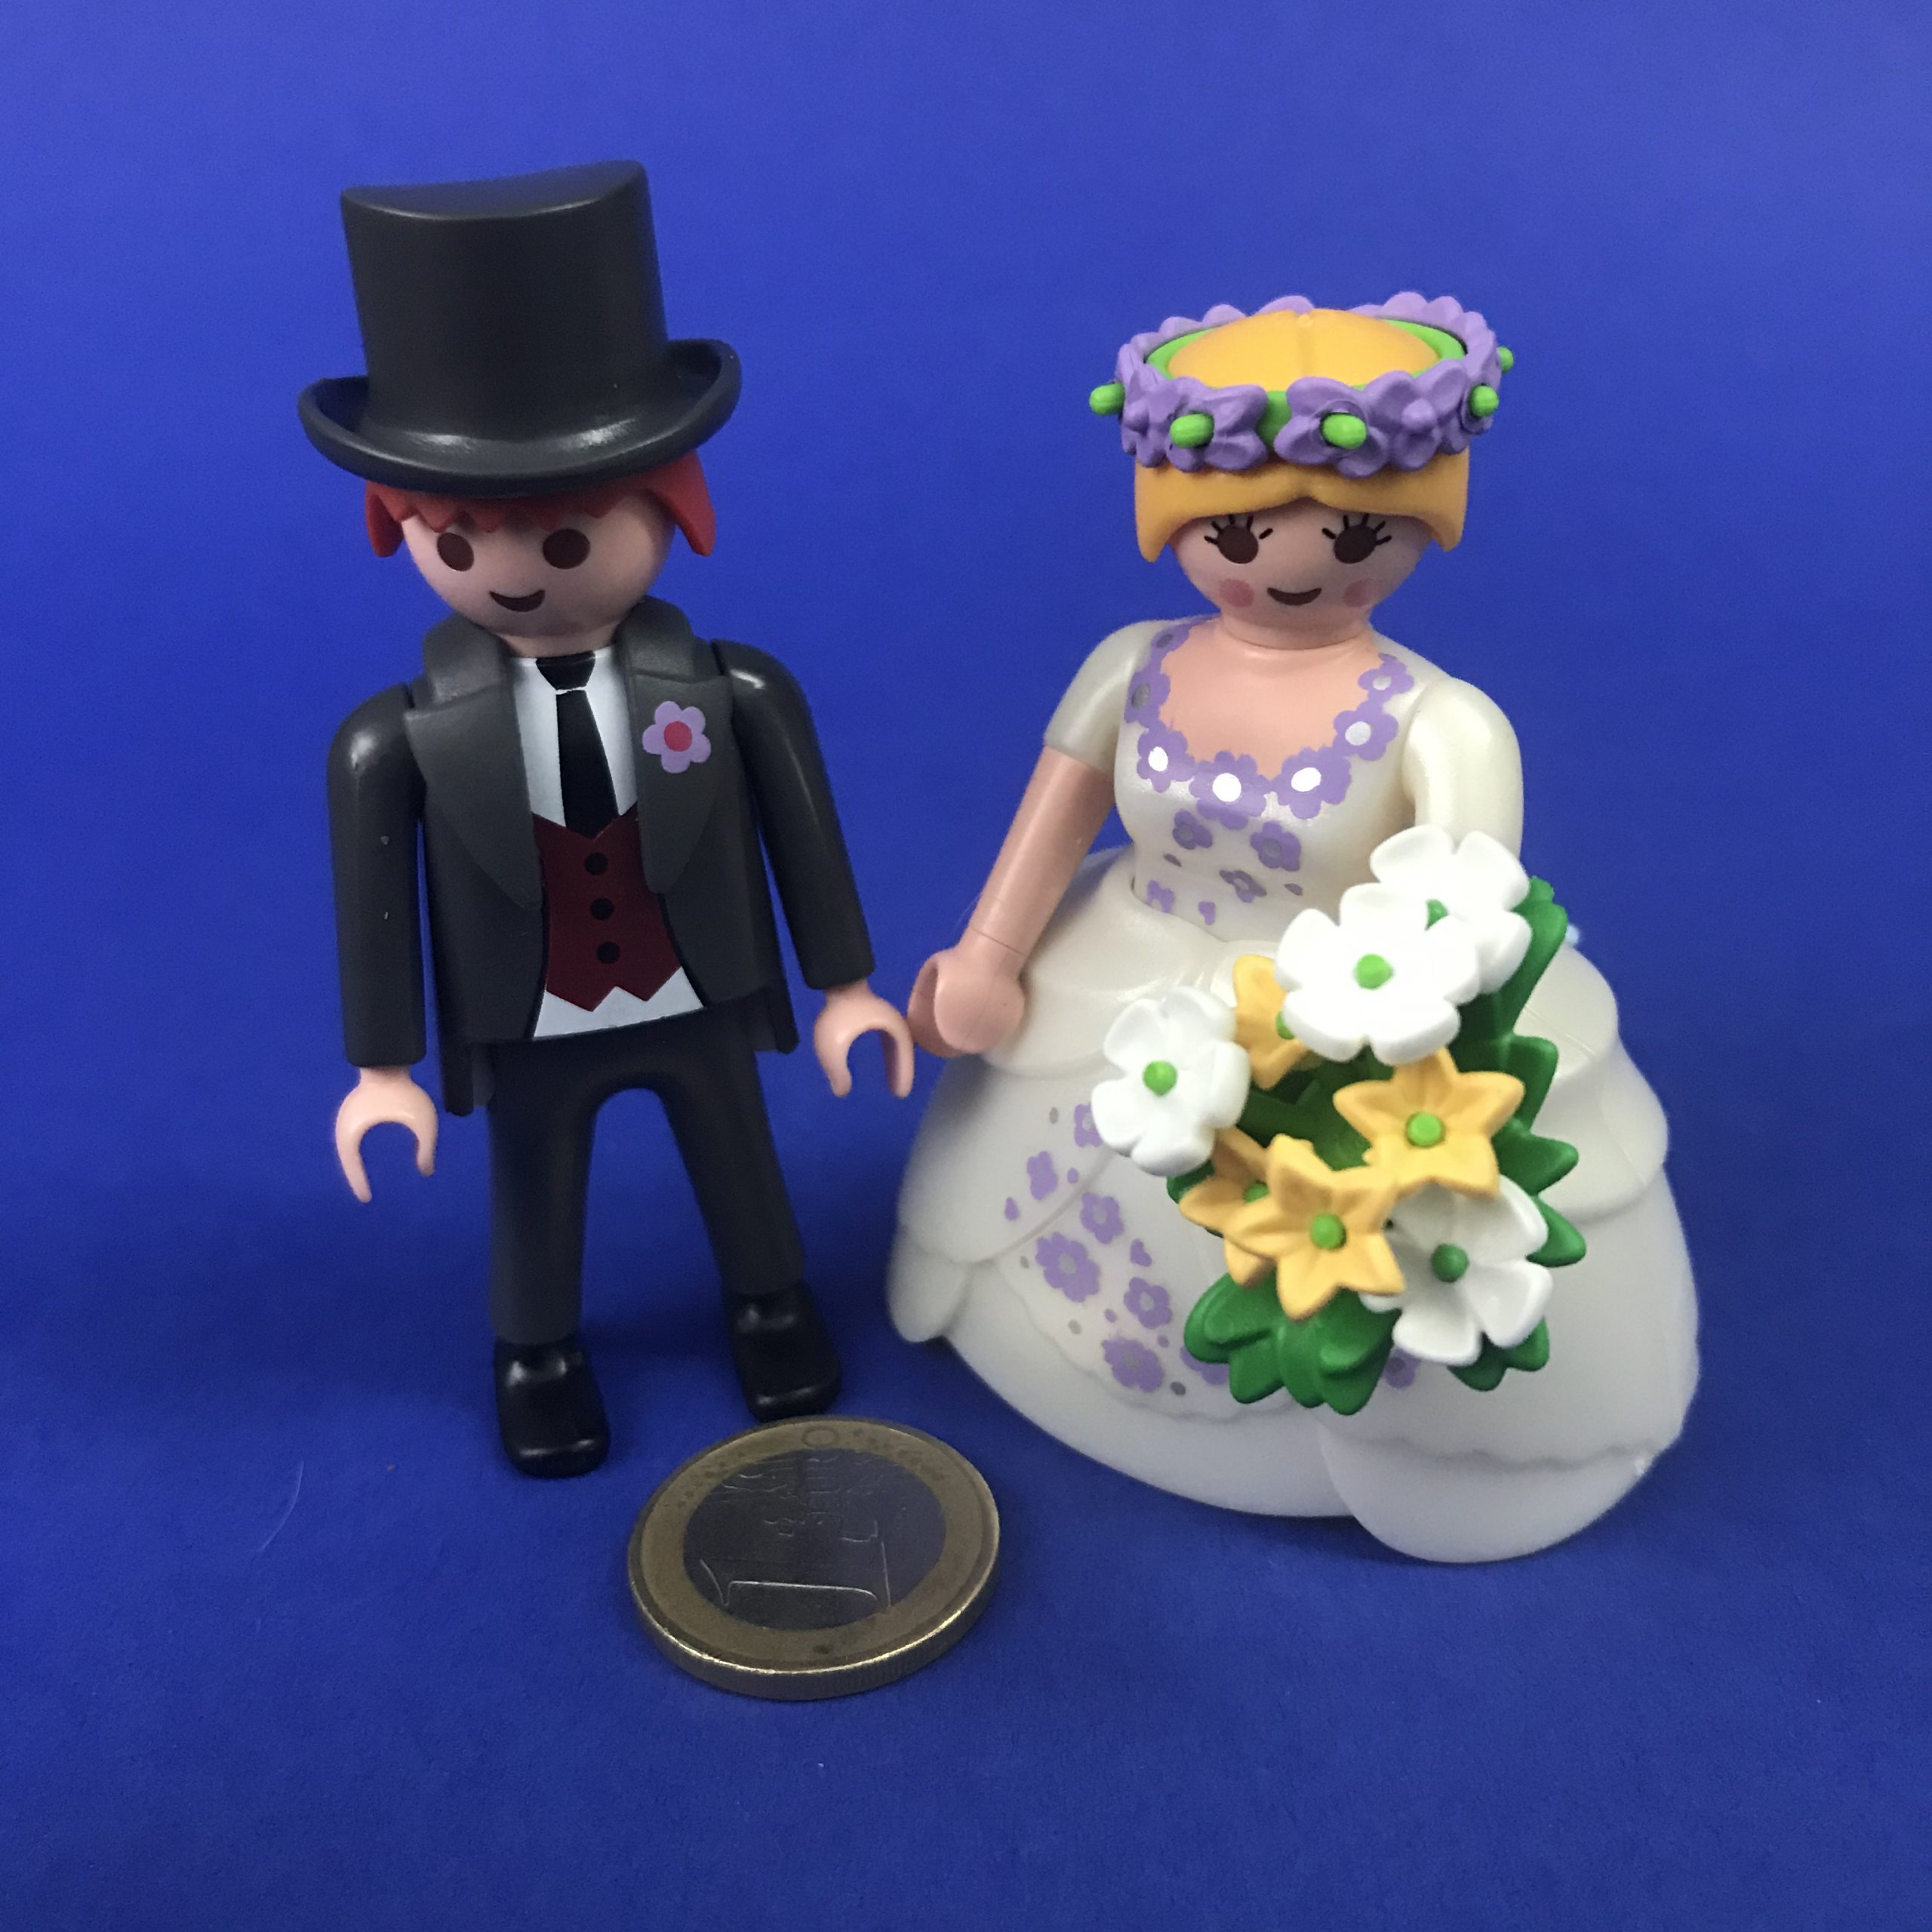 Playmobil-bruidspaar